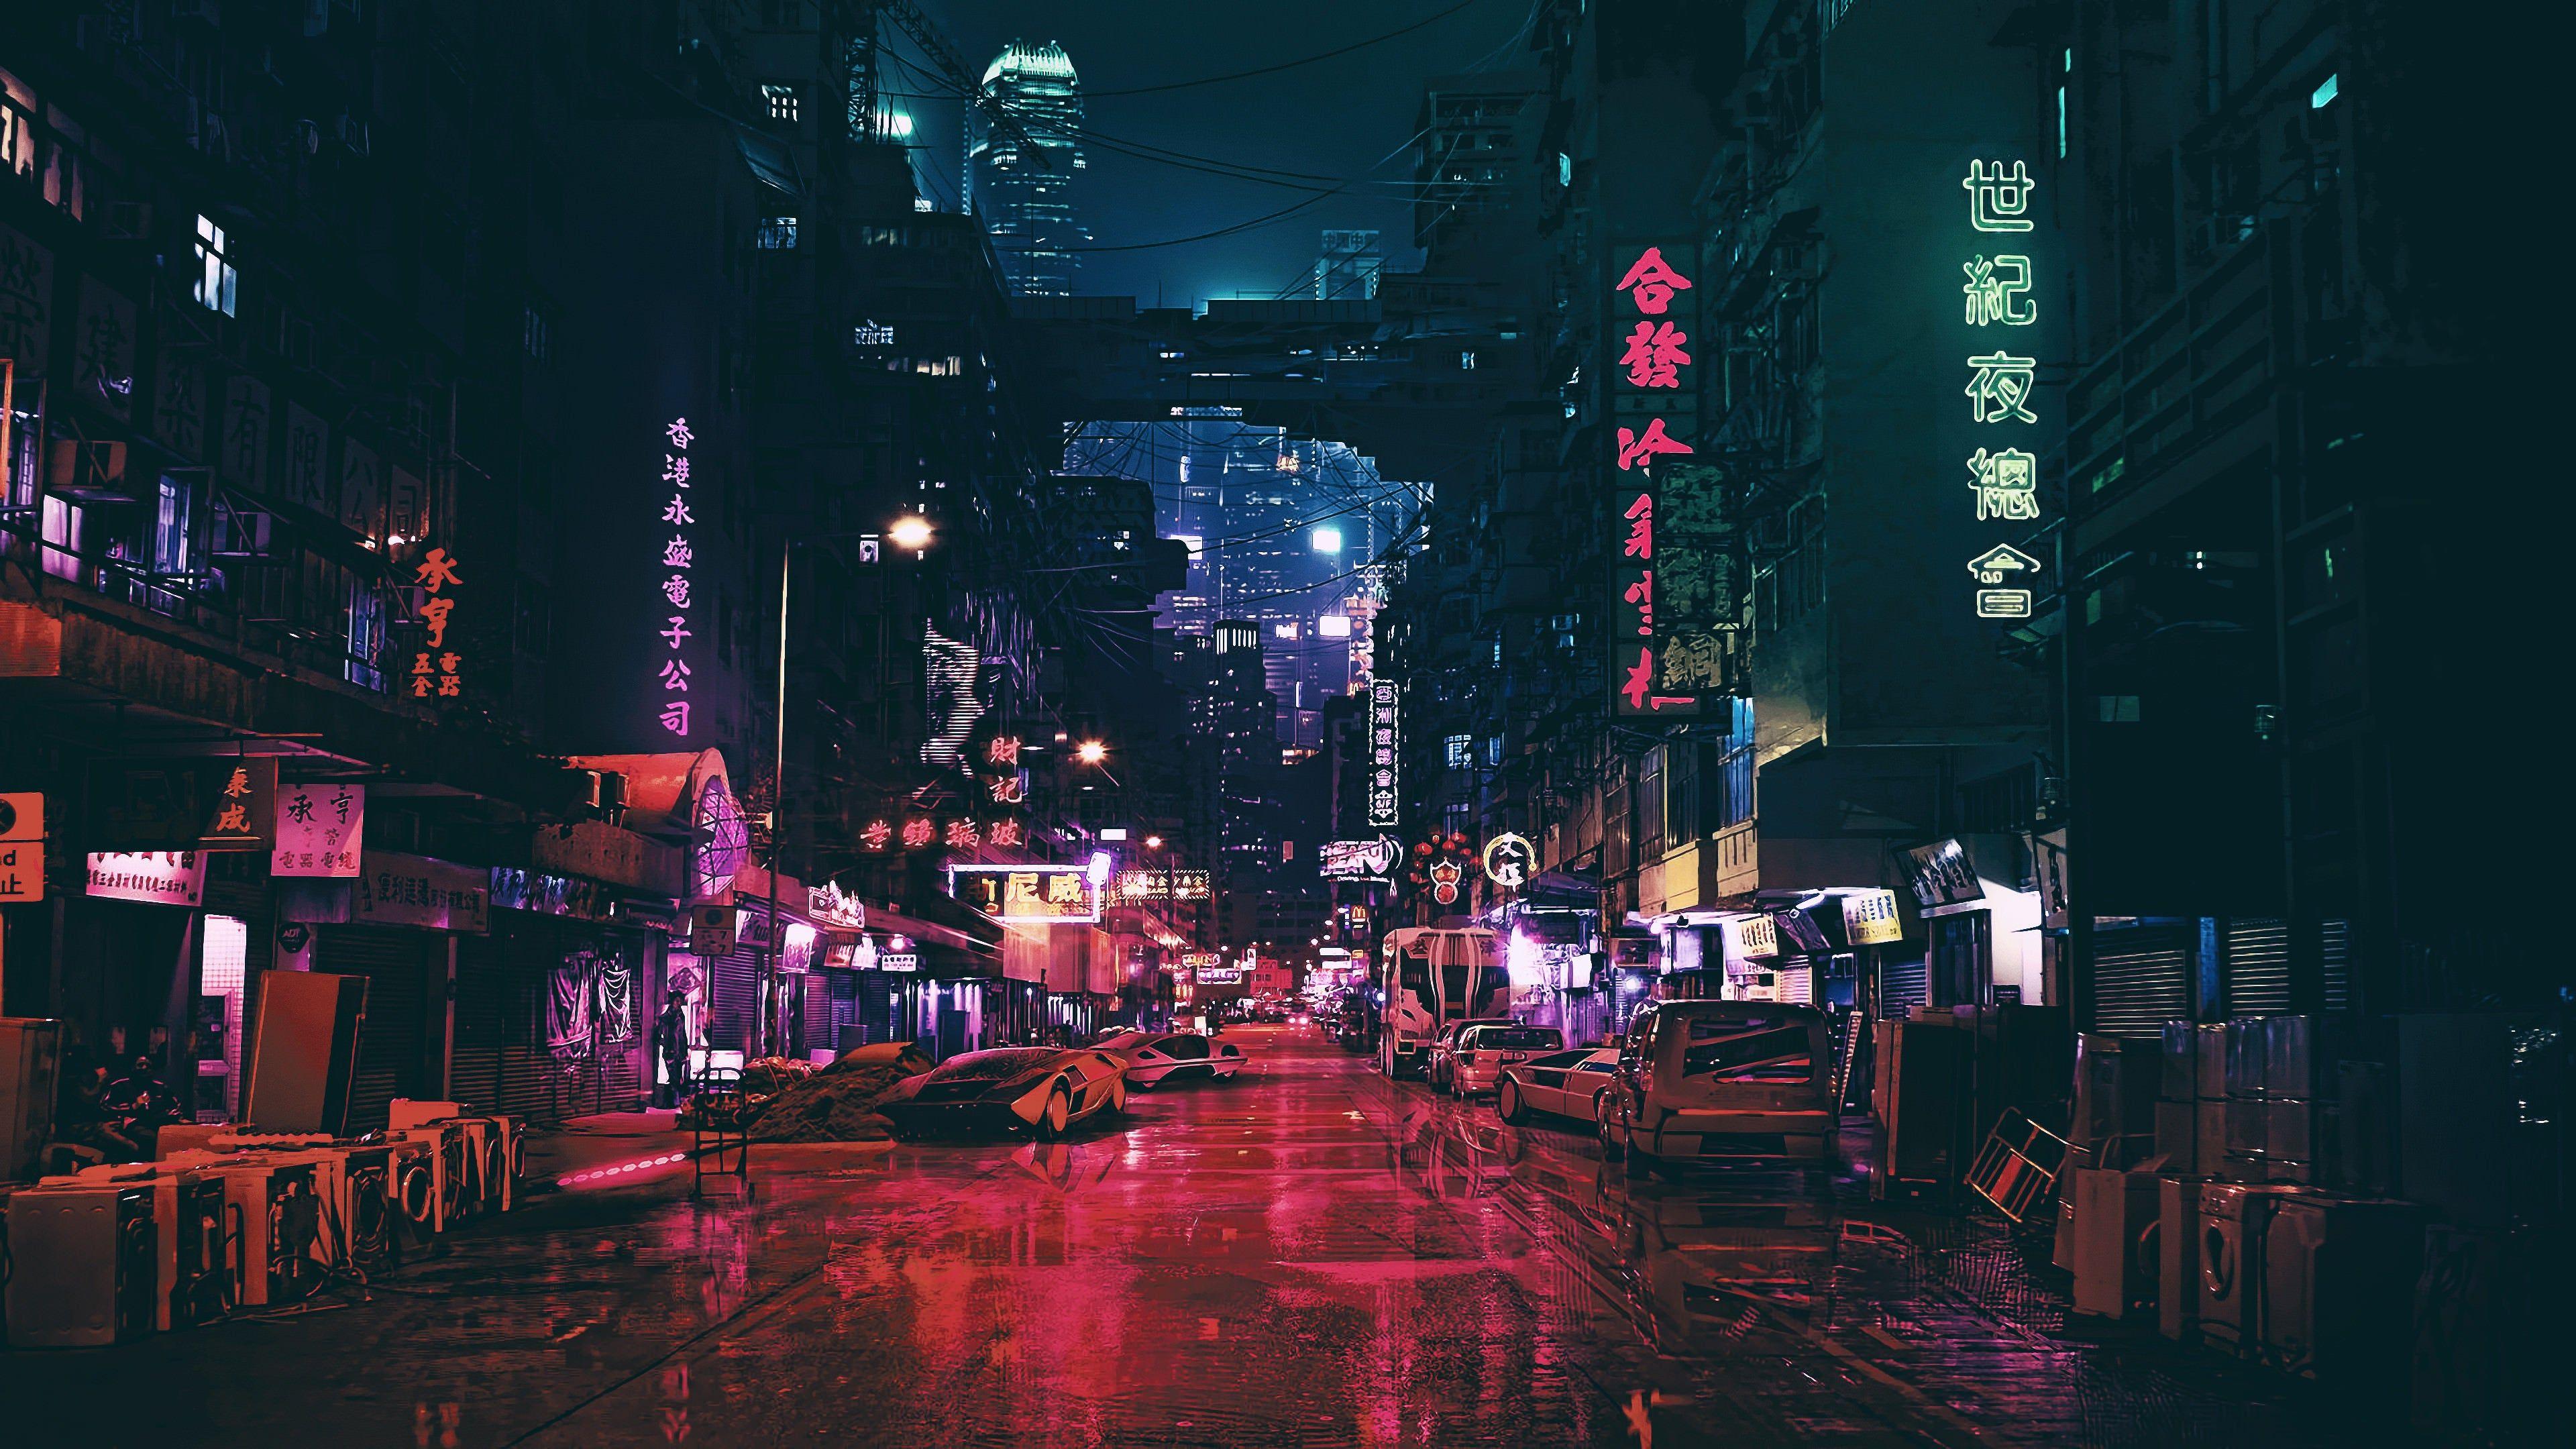 Similar To Blade Runner 4k Wallpaper City Wallpaper Futuristic City Cyberpunk City